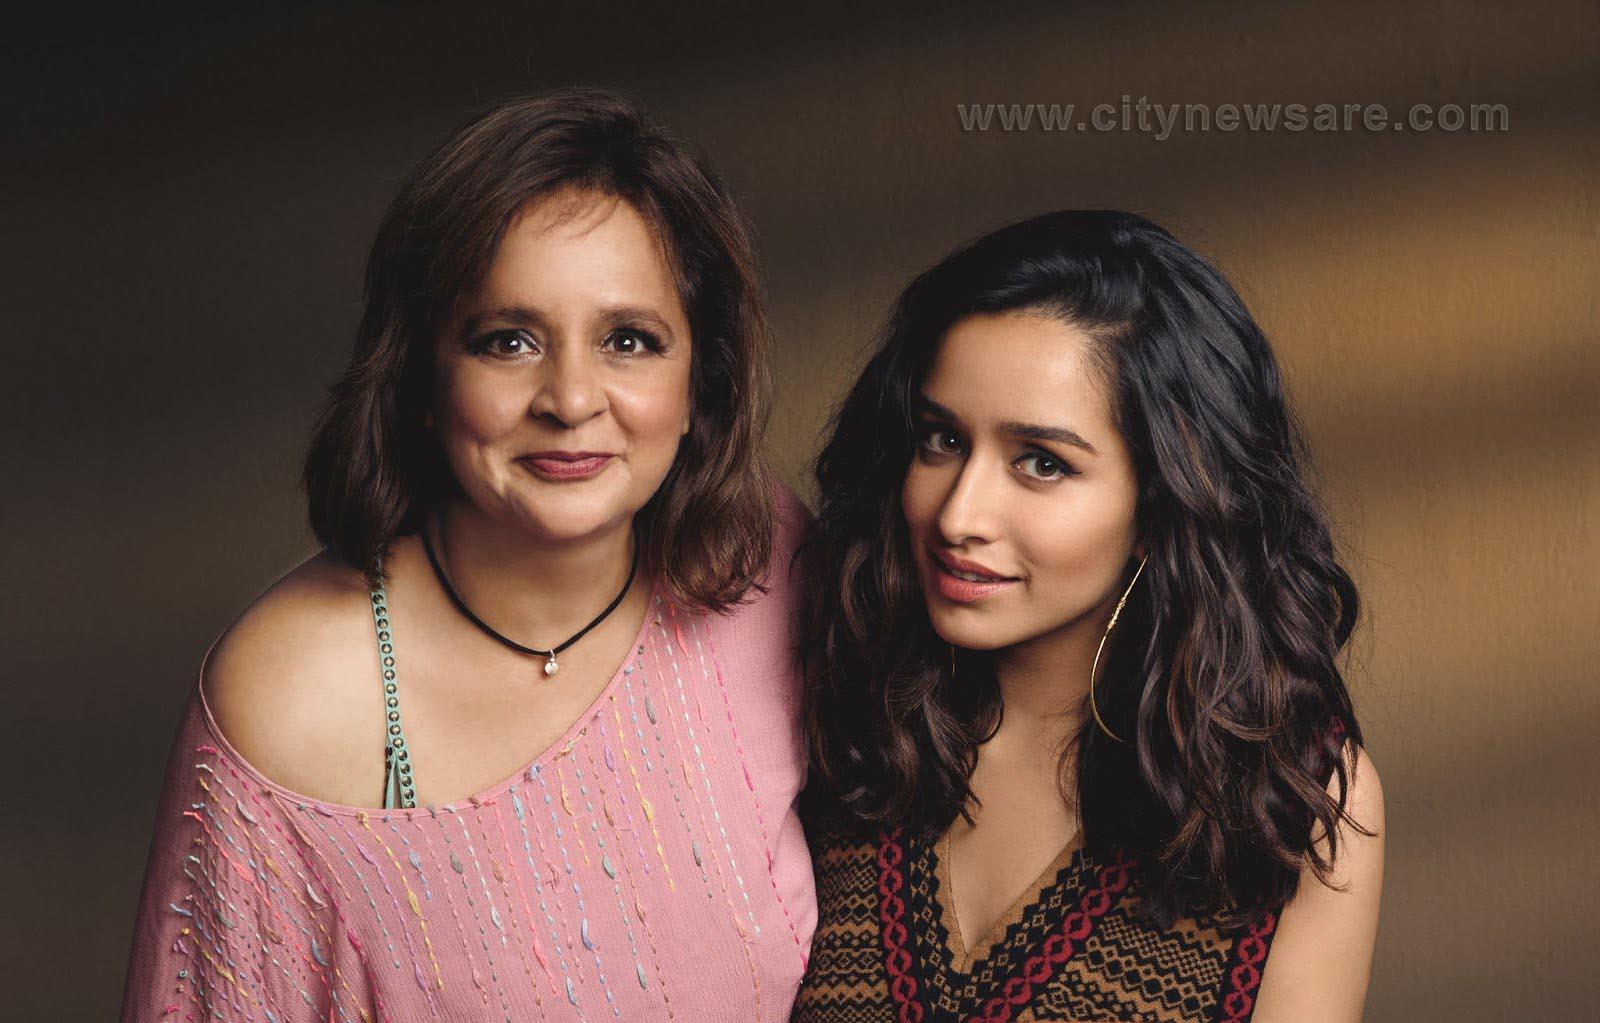 Nina Lekhi and Shraddha Kapoor